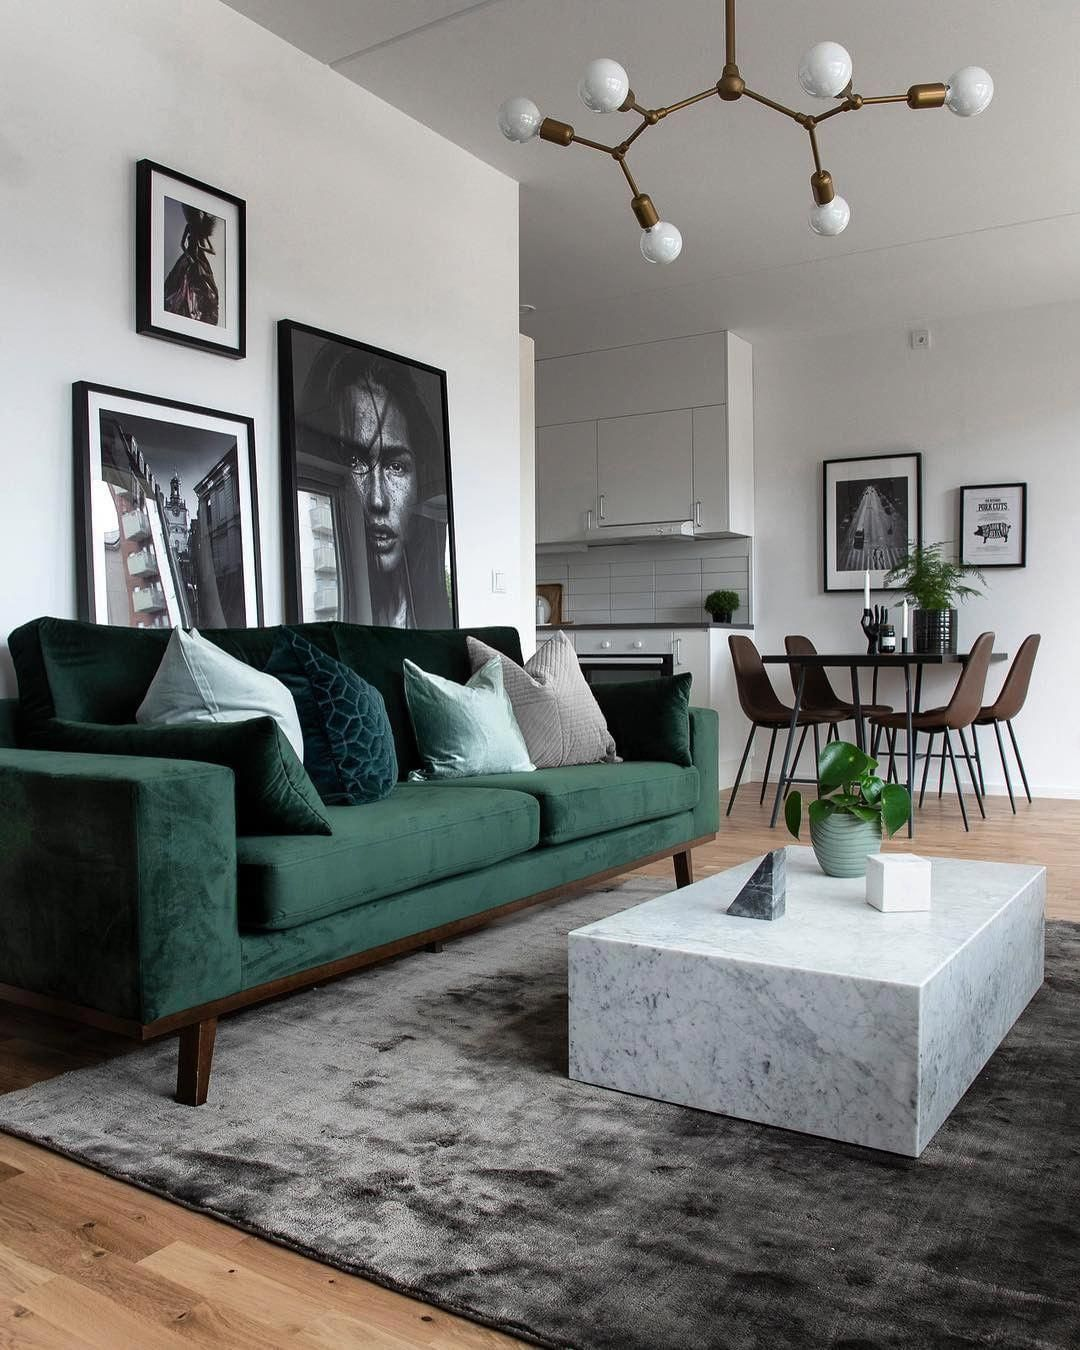 Apartment Decor For Young Professionals Interior Design Interior Design Ideas Interior Design A Scandi Living Room Living Room Scandinavian Classic Living Room